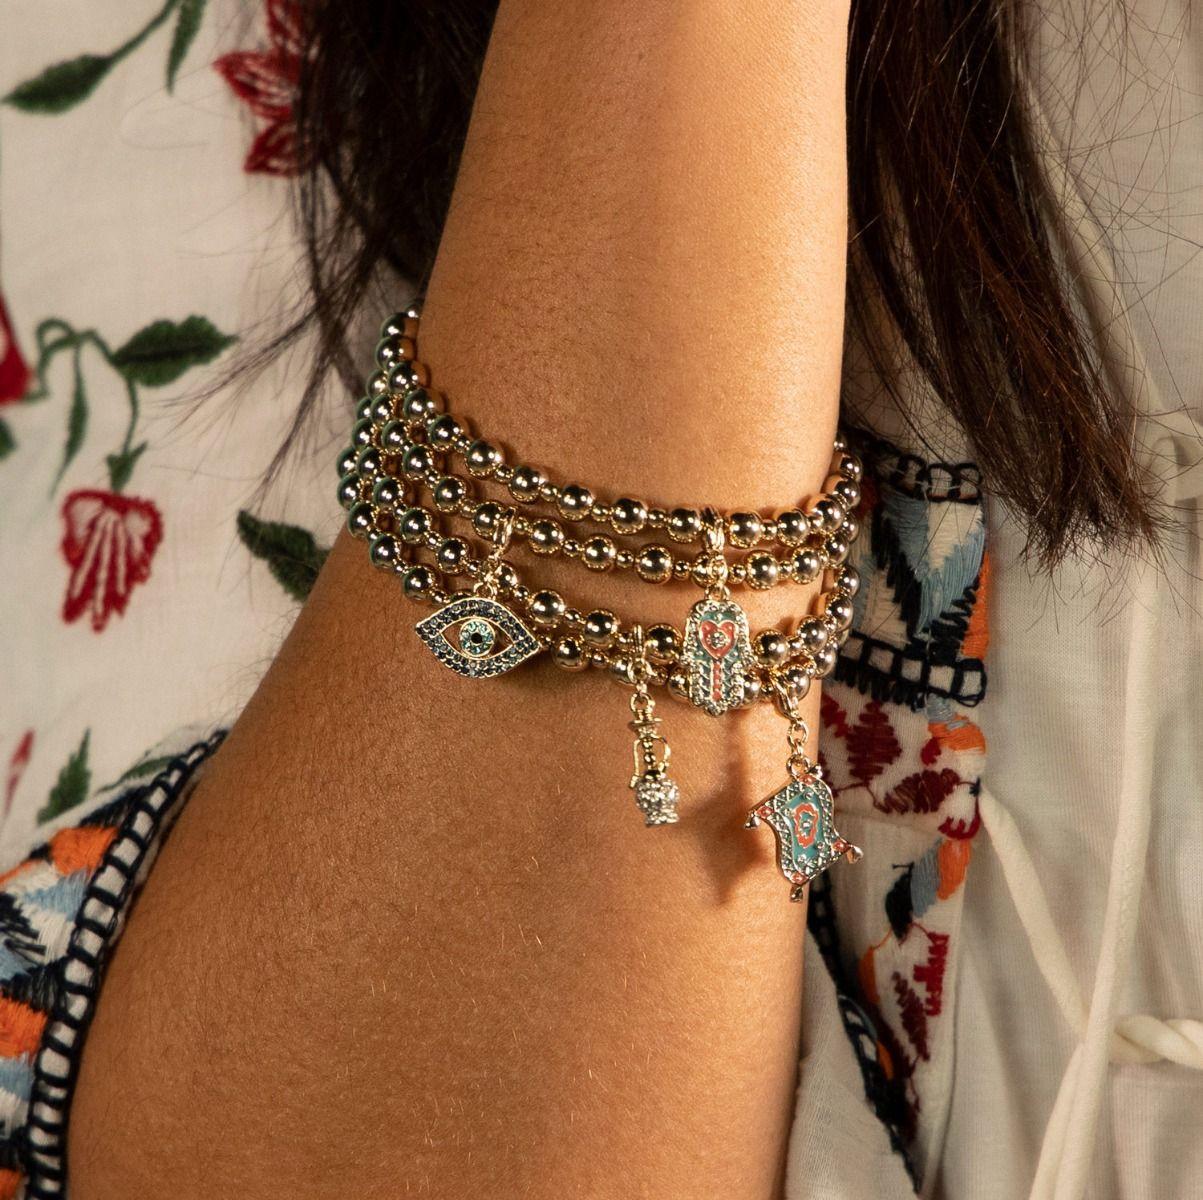 Buckley London Hamsa Hand Charm Bracelet